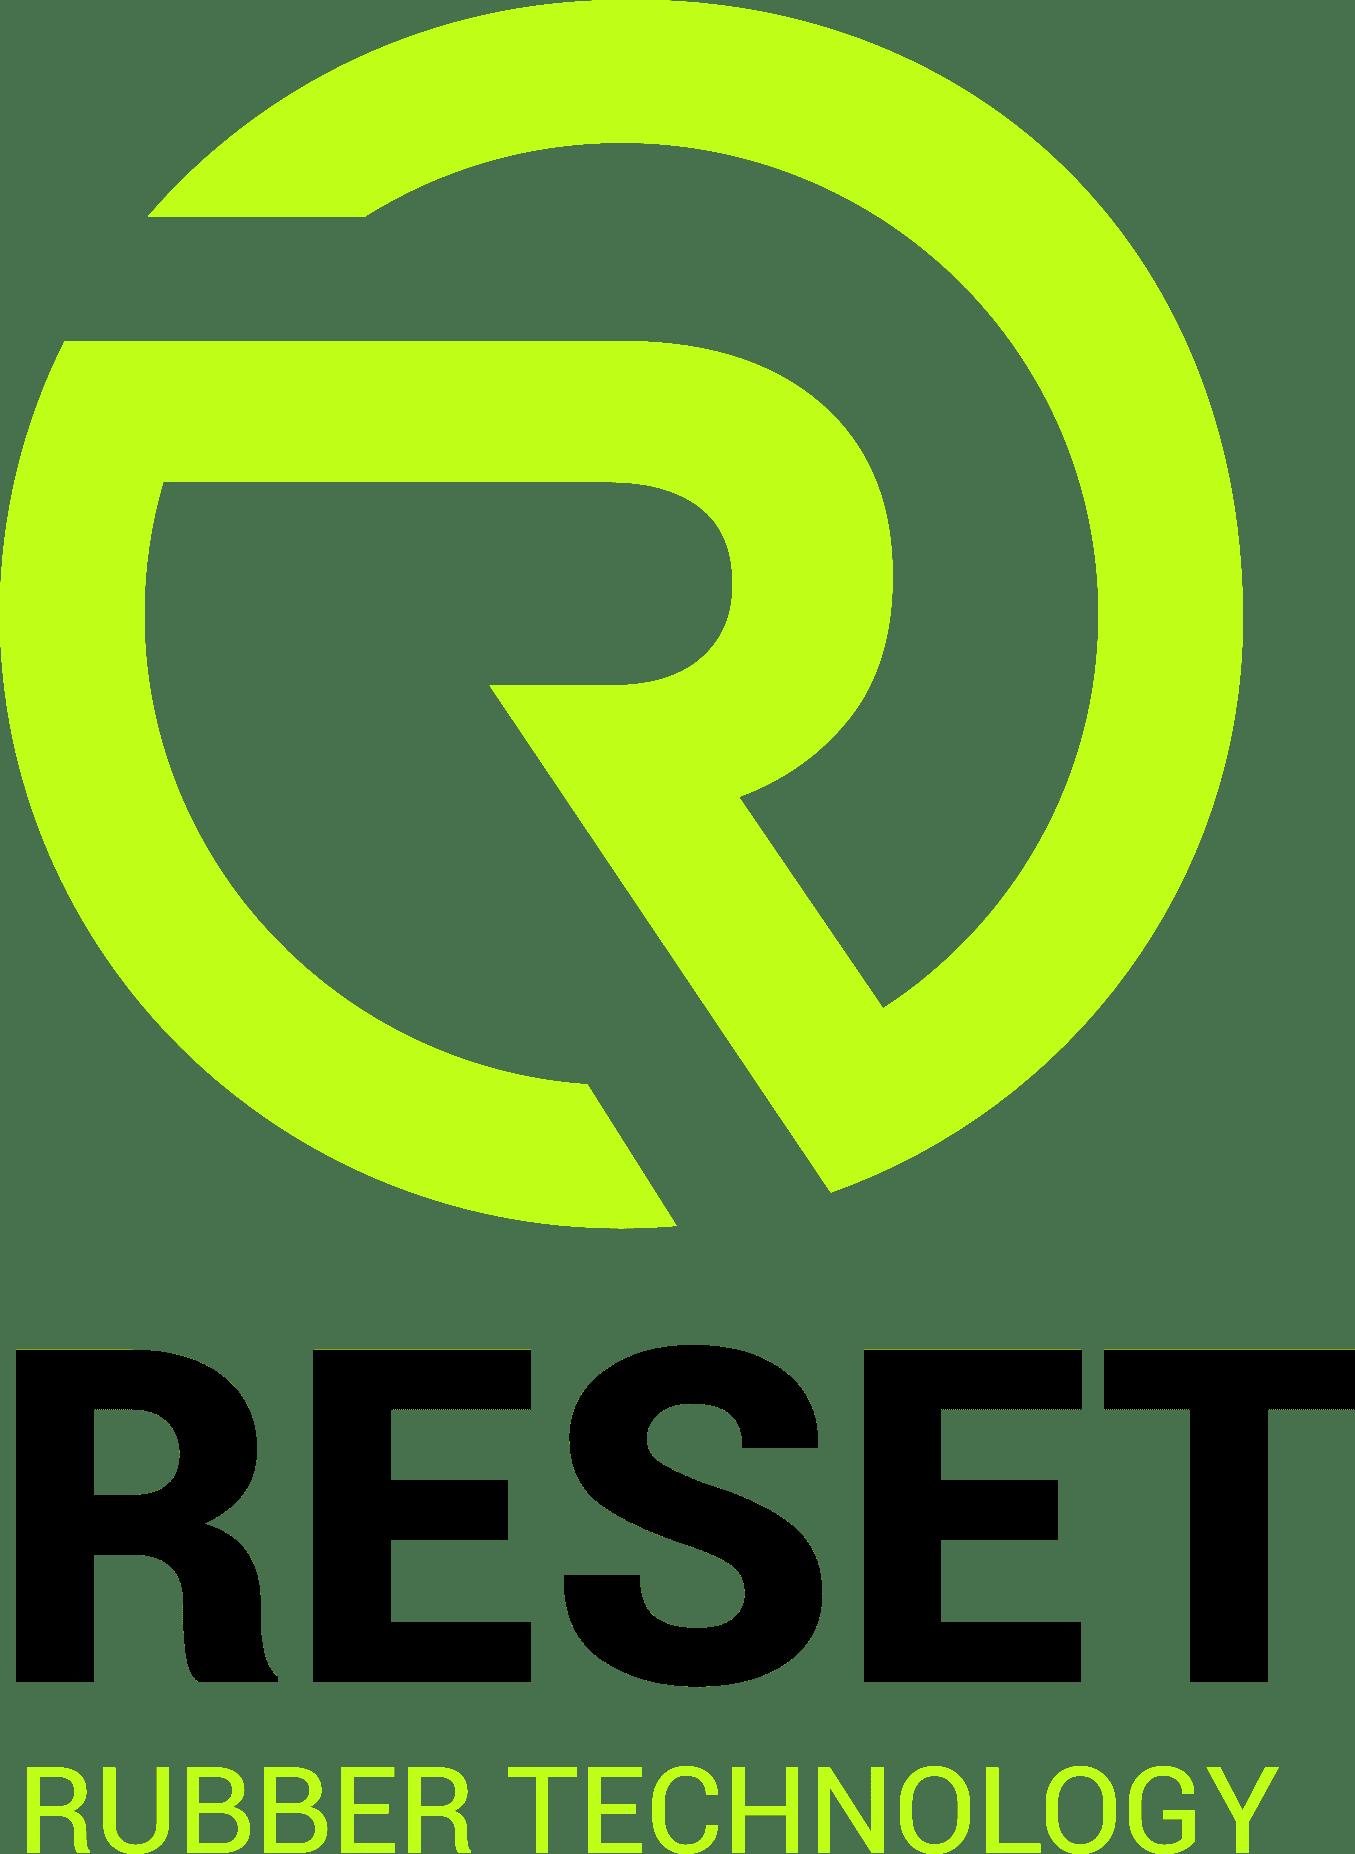 LOGO-RESET_1 IGX F1 RESET